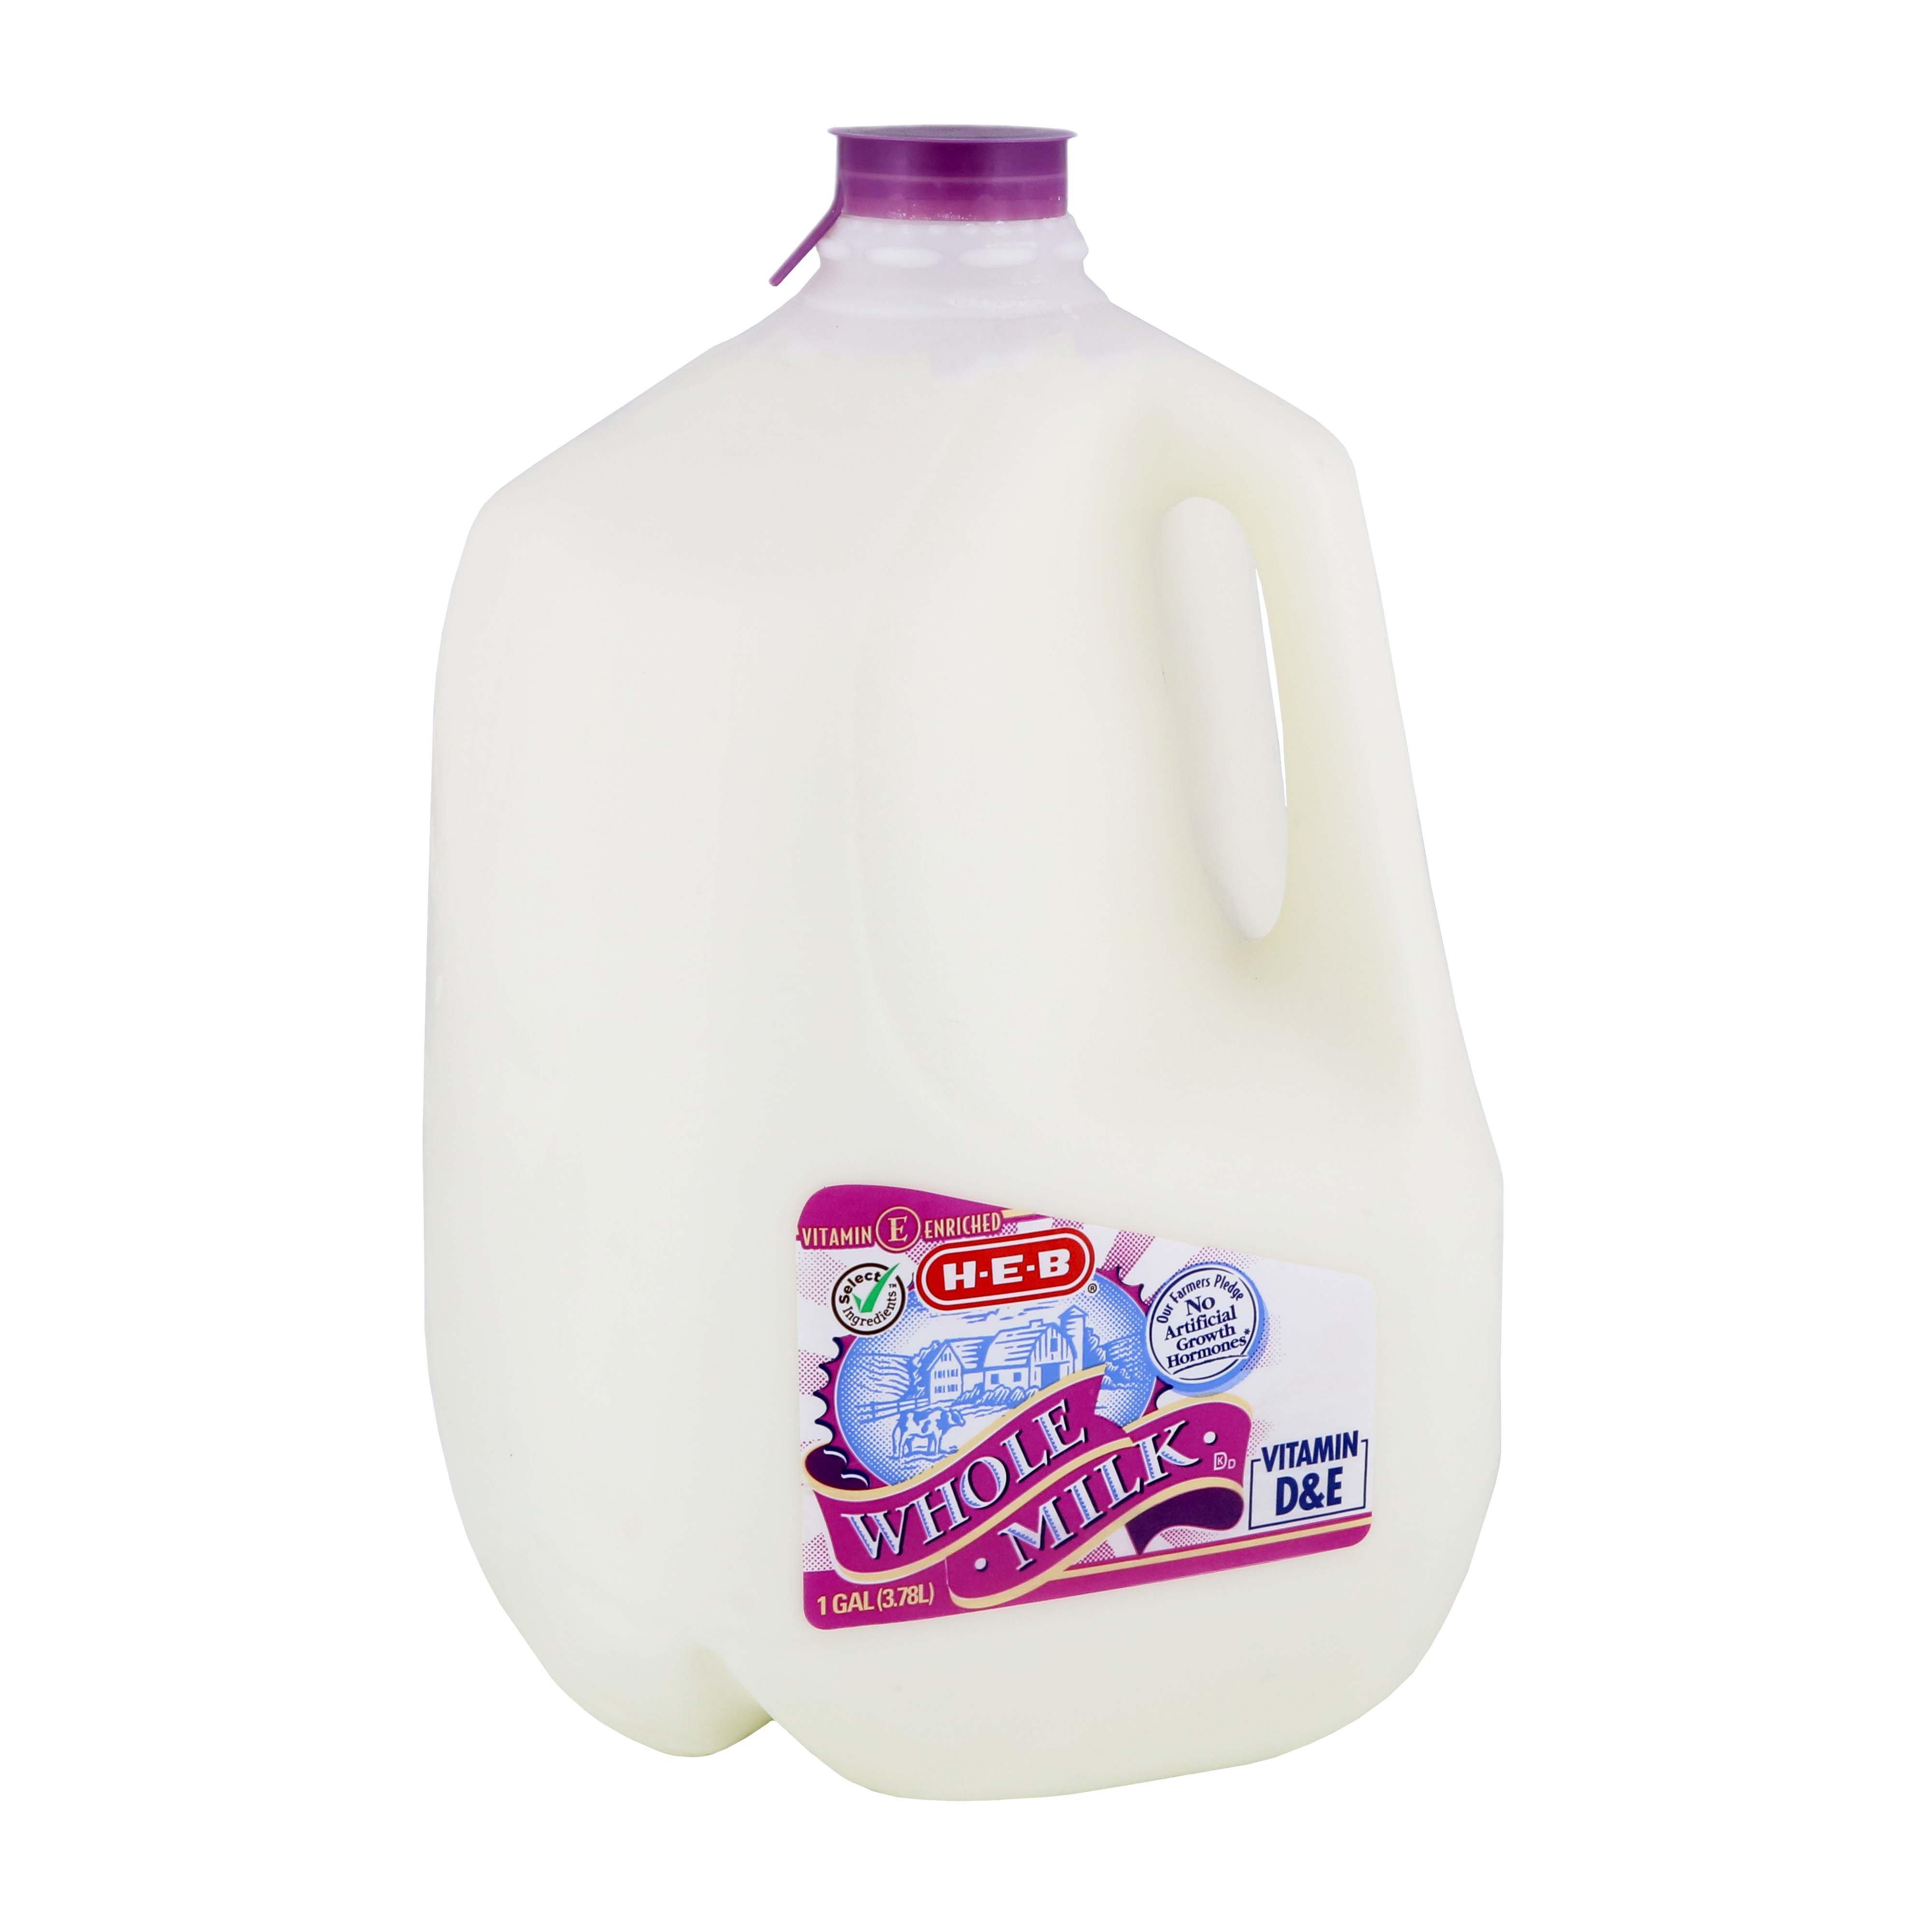 Milk ‑ Shop H‑E‑B Everyday Low Prices